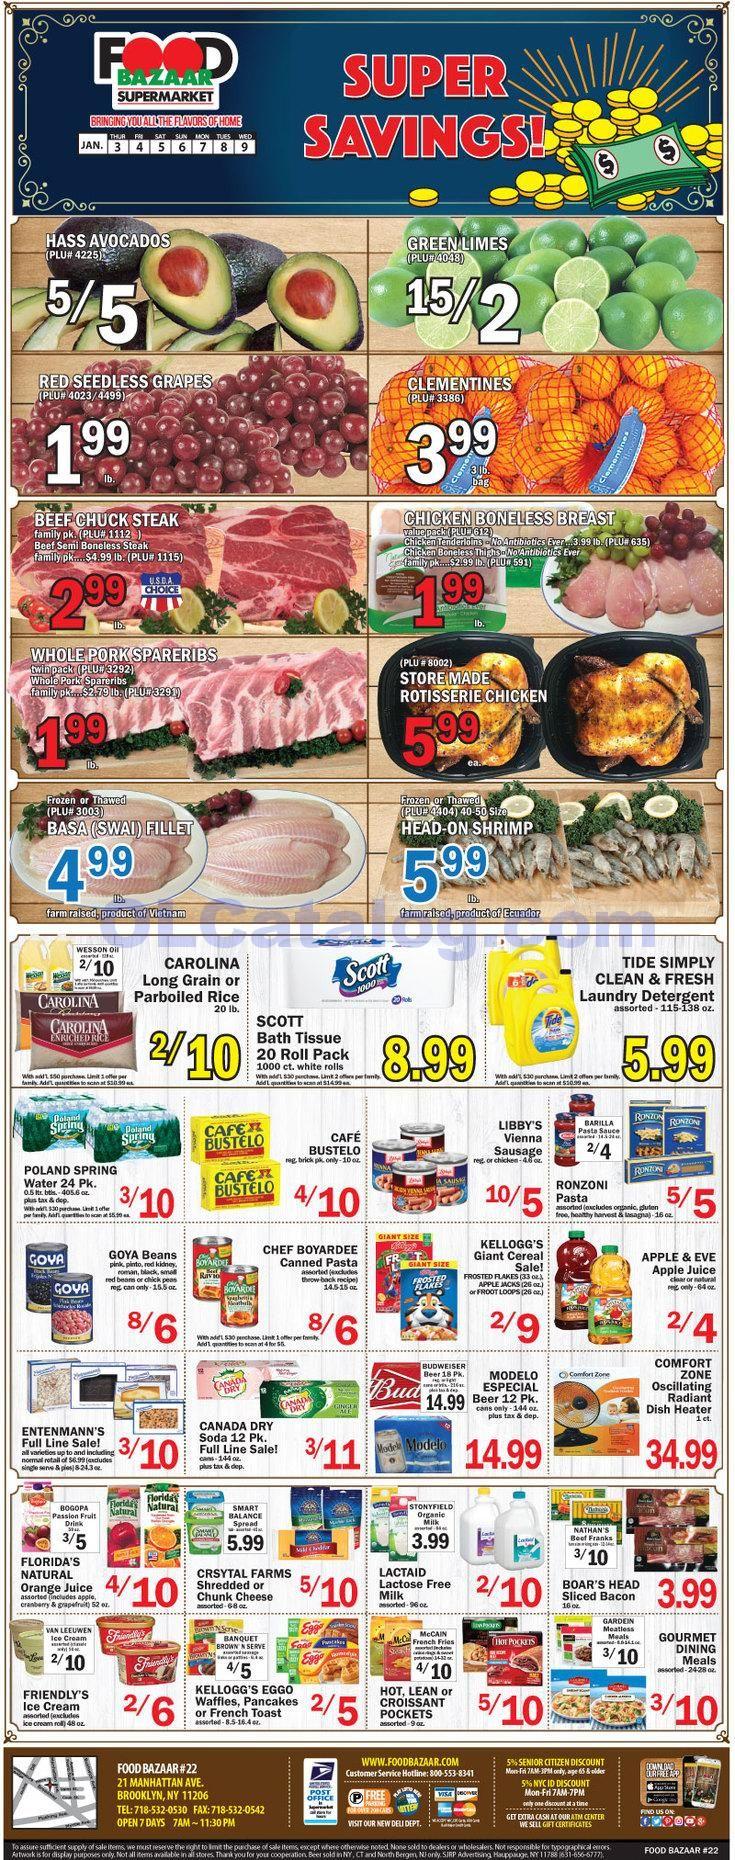 Food bazaar weekly ad january 3 9 2019 do you know